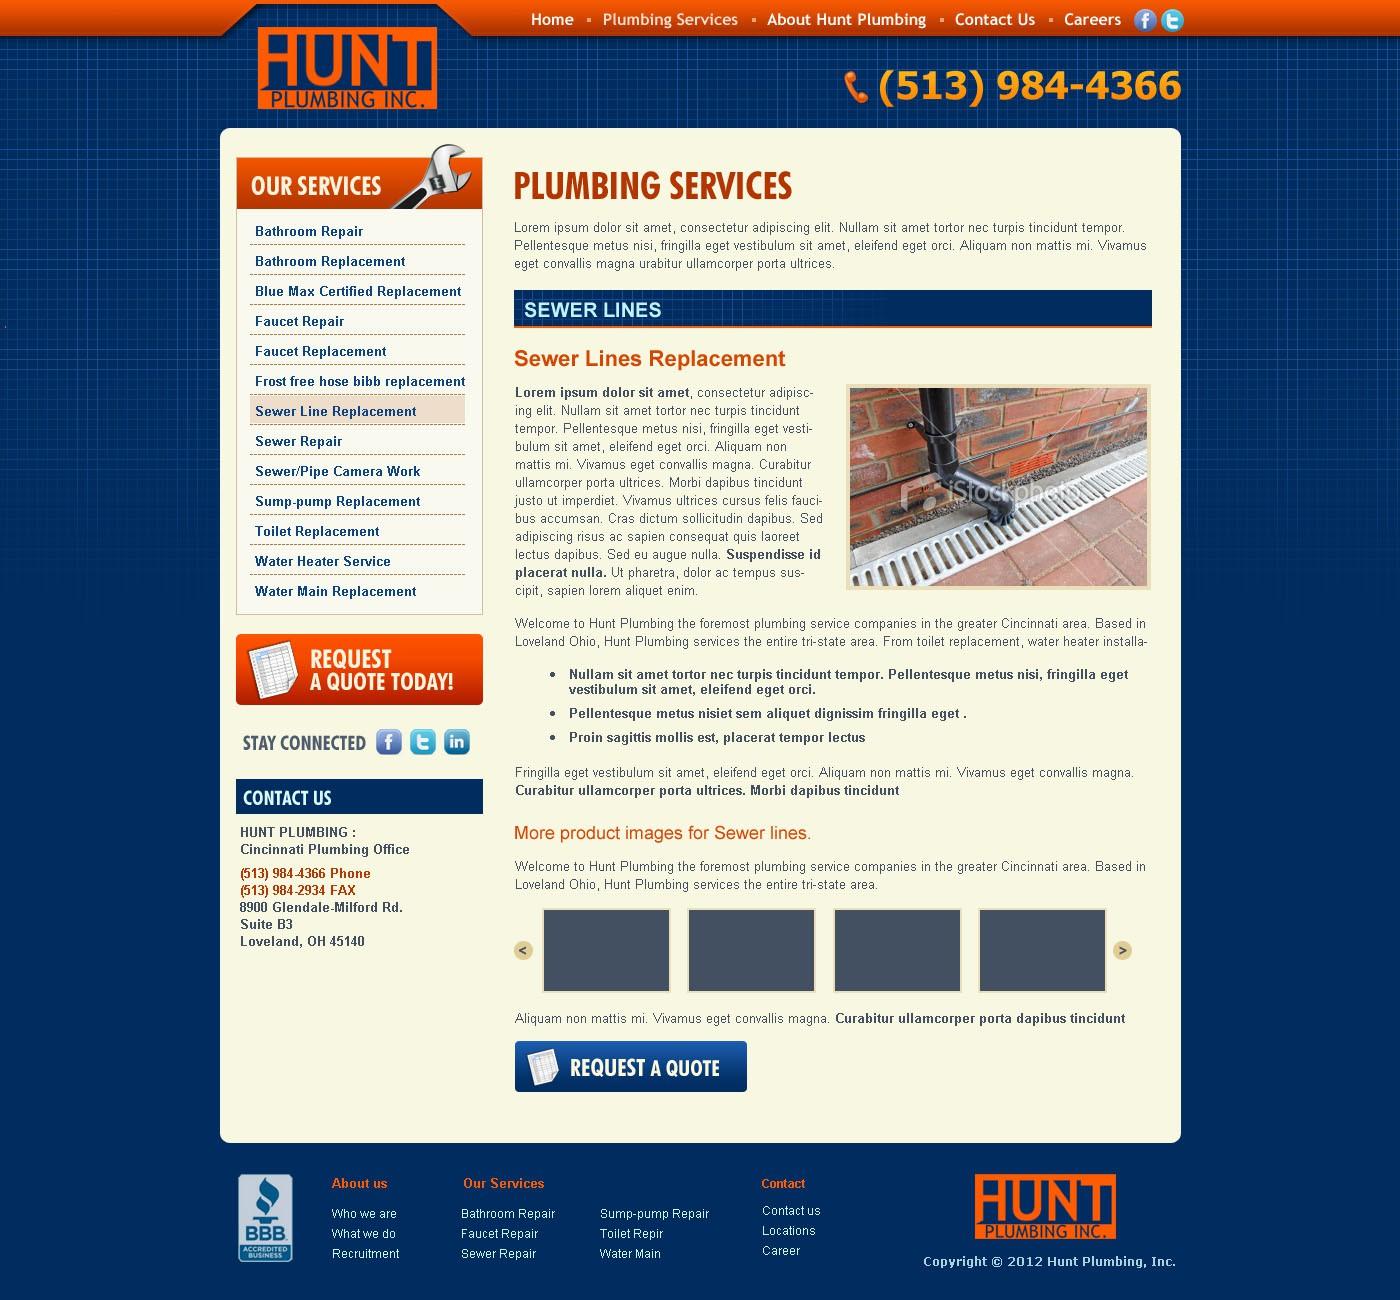 New website design wanted for Hunt Plumbing